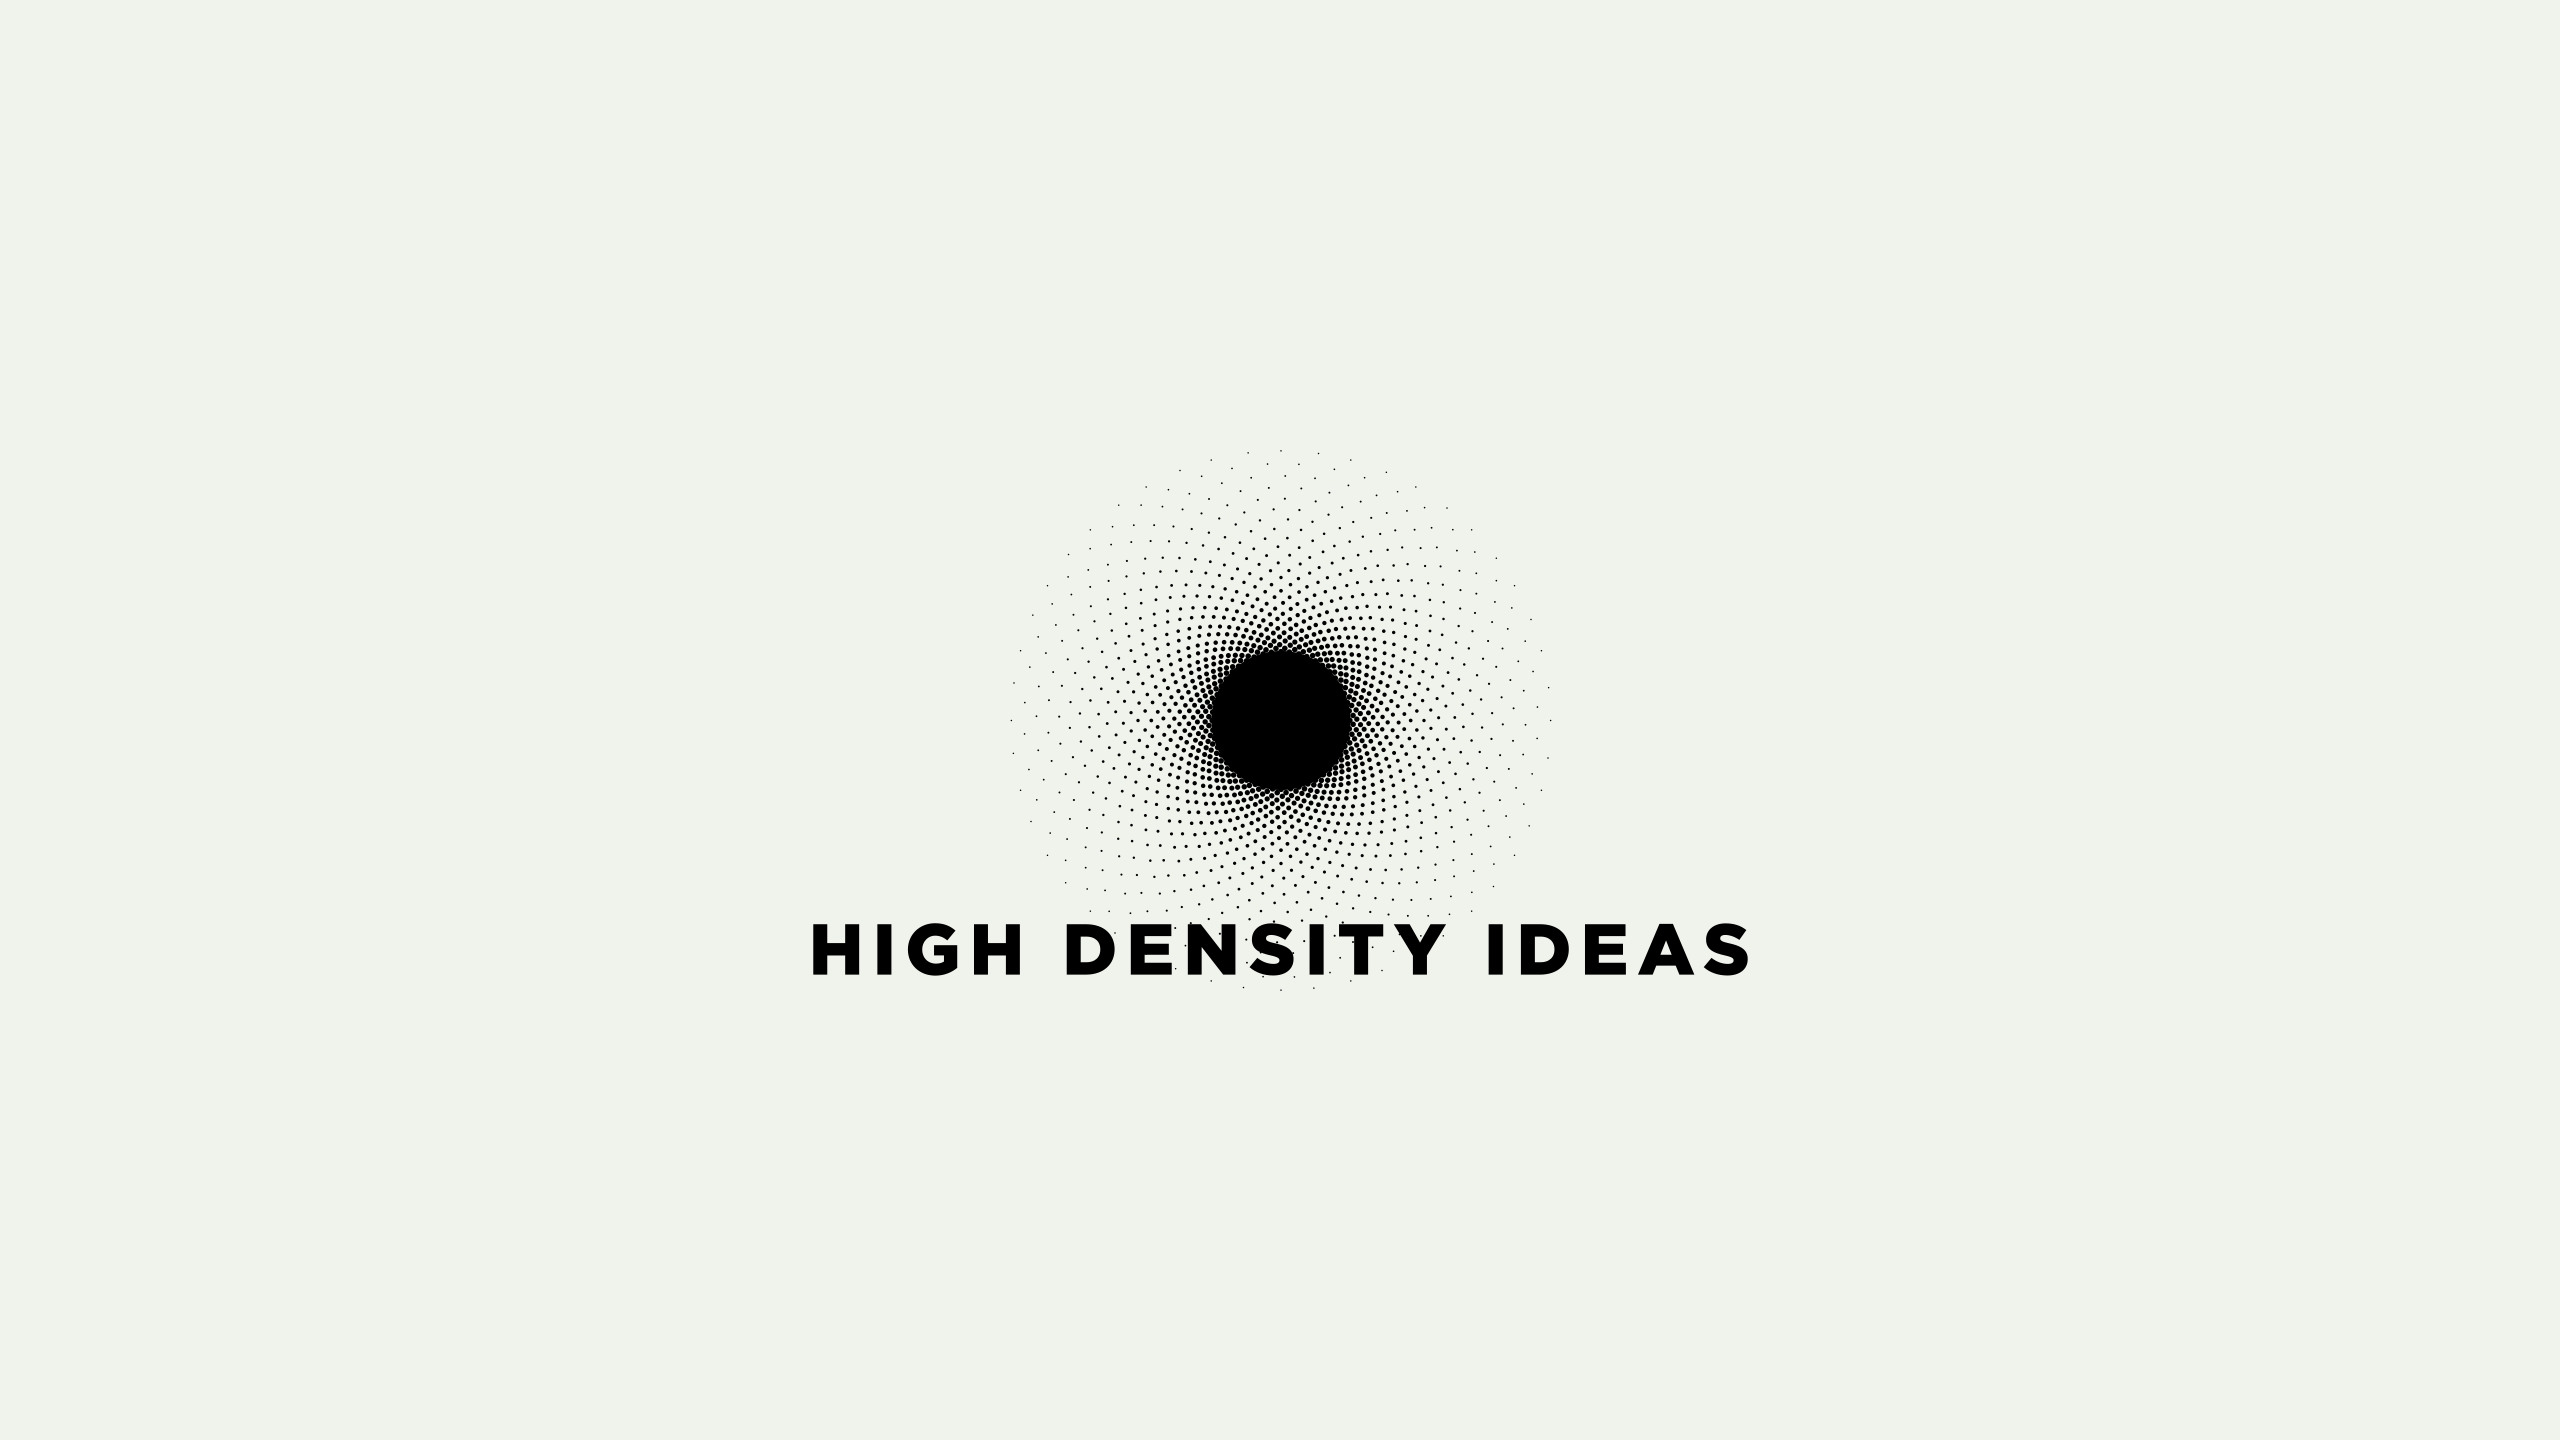 Logo design for Hig Density Ideas. black hole vibrant logo design